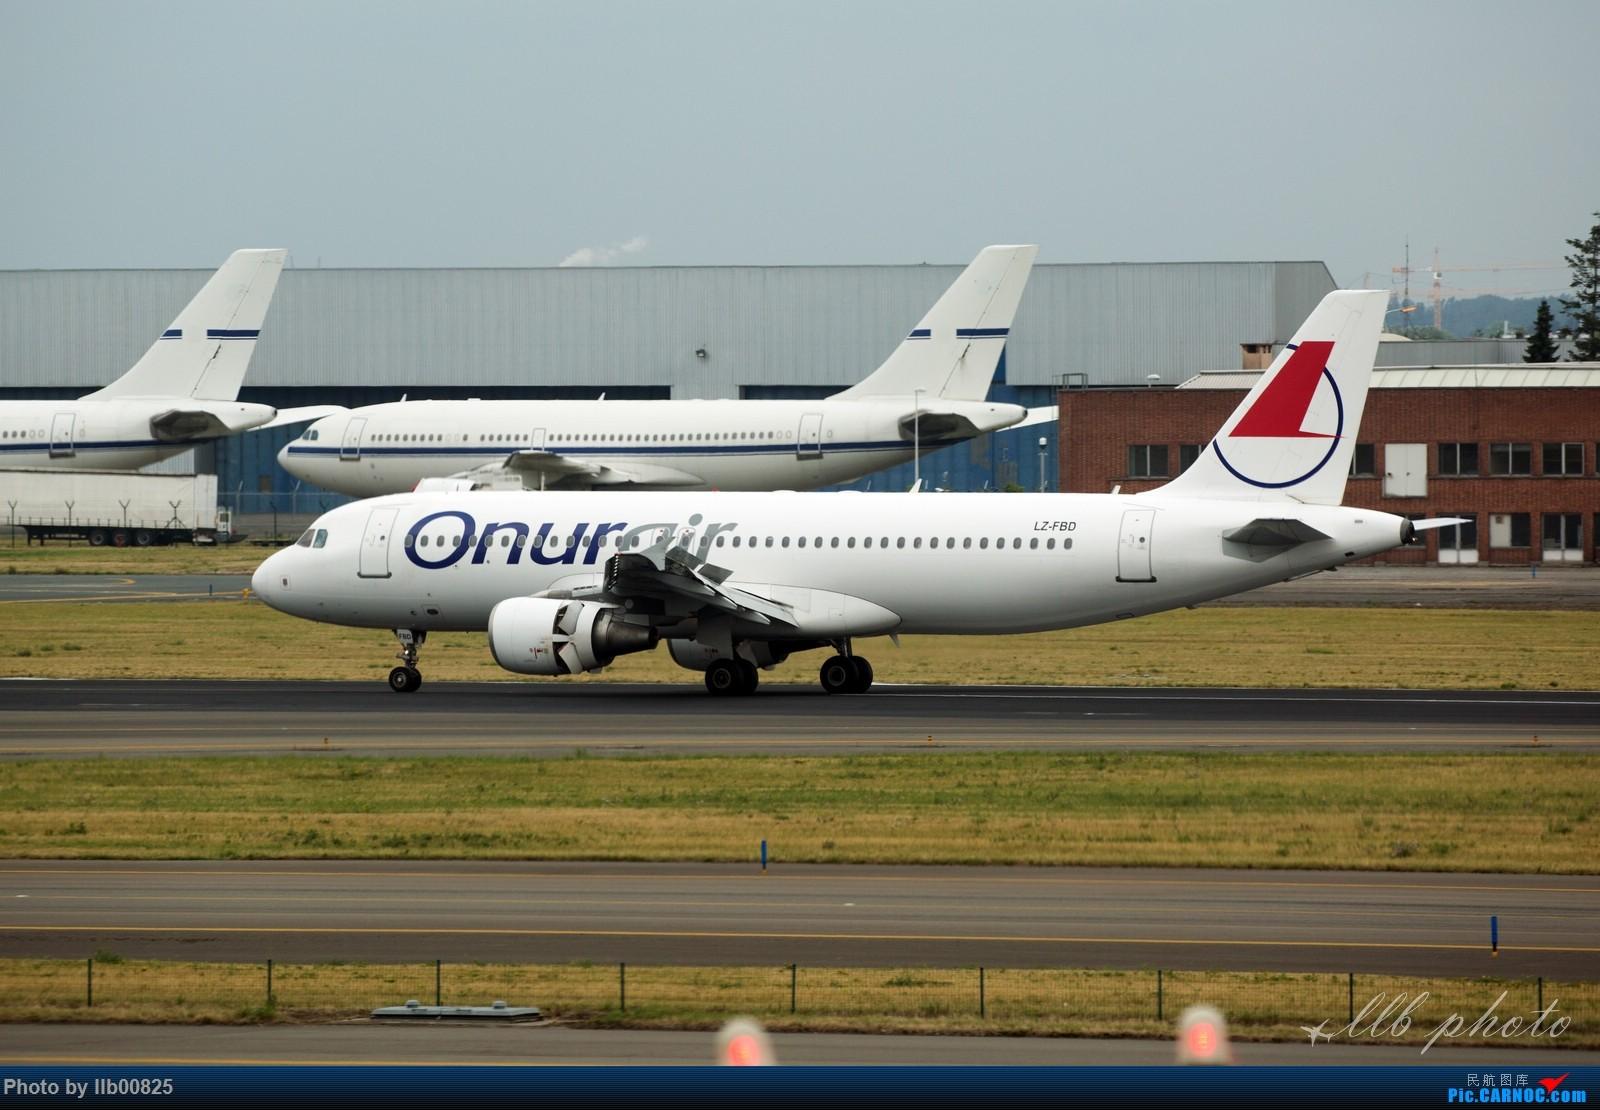 Re:[原创]赫尔辛基-布鲁塞尔一些杂图 AIRBUS A320 LZ-FBD 比利时布鲁塞尔机场